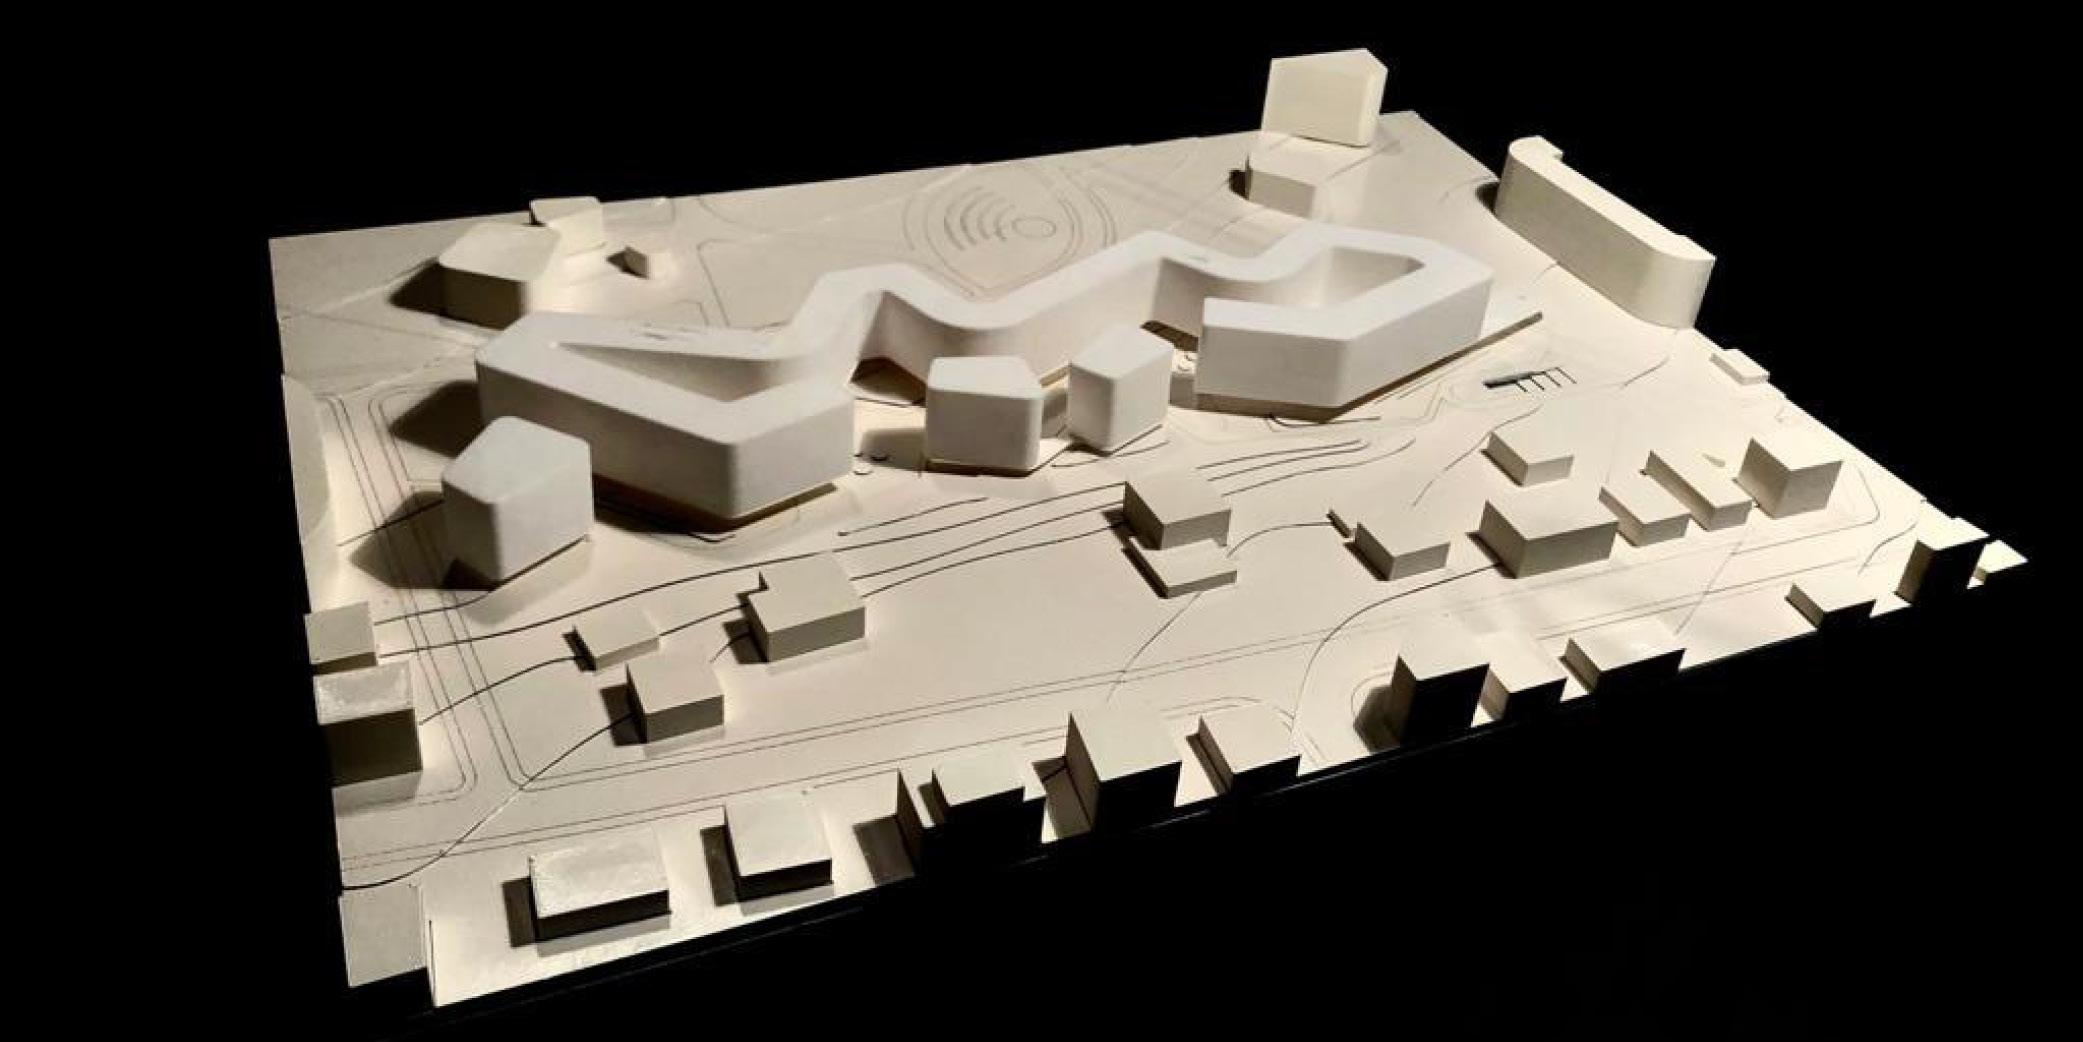 OCA architects Dormitories of the Cyprus University of Technology in Limassol - Κοιτώνες Κύπρος Λεμεσός Hernan Lleida Ruiz Bernardo Garcia Morales12